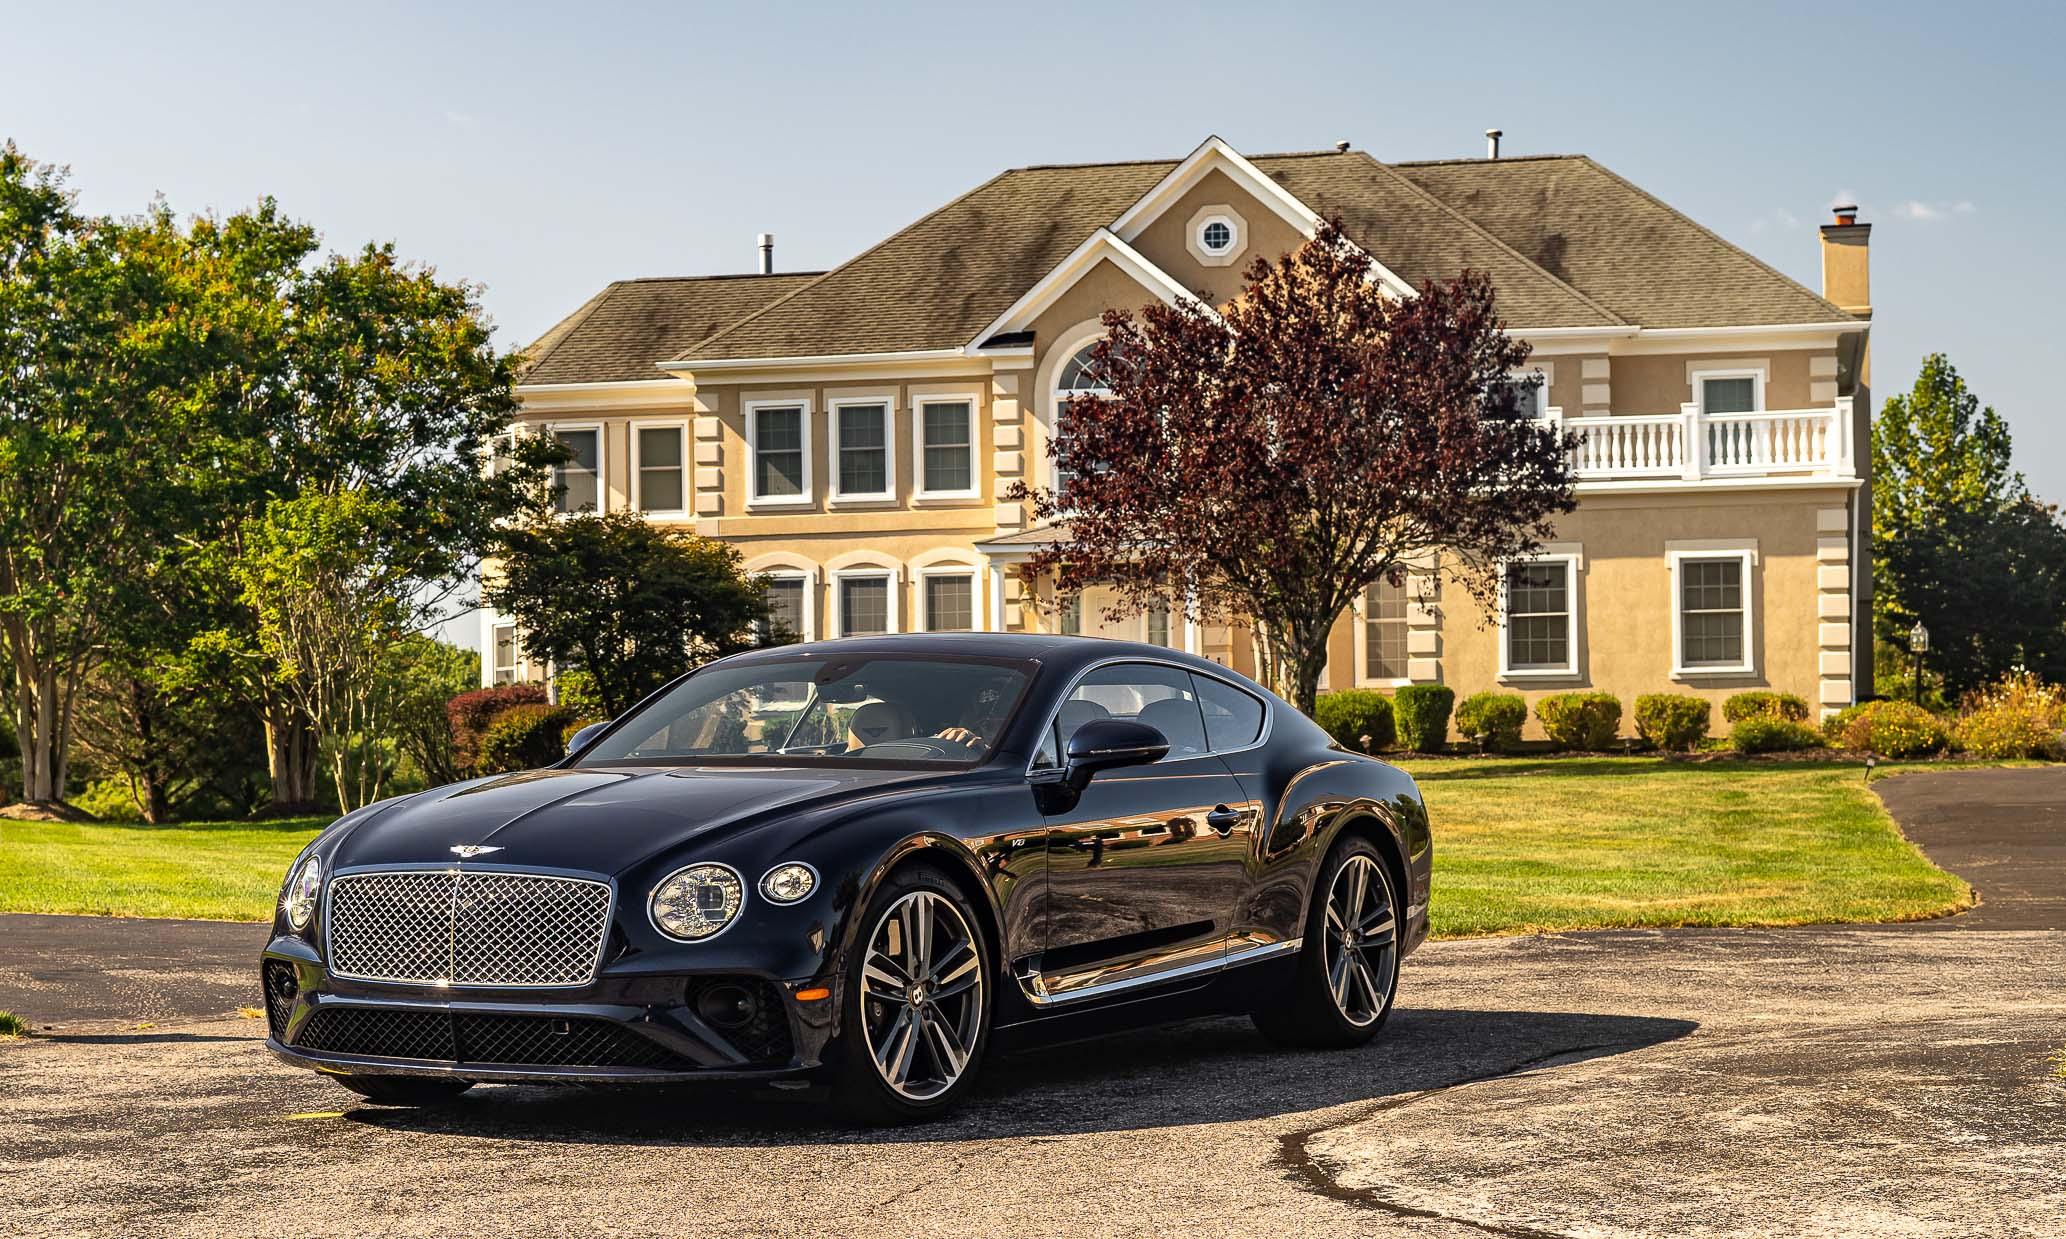 2020 Bentley Continental GT V8: Opulent Lifestyles - MEA ...